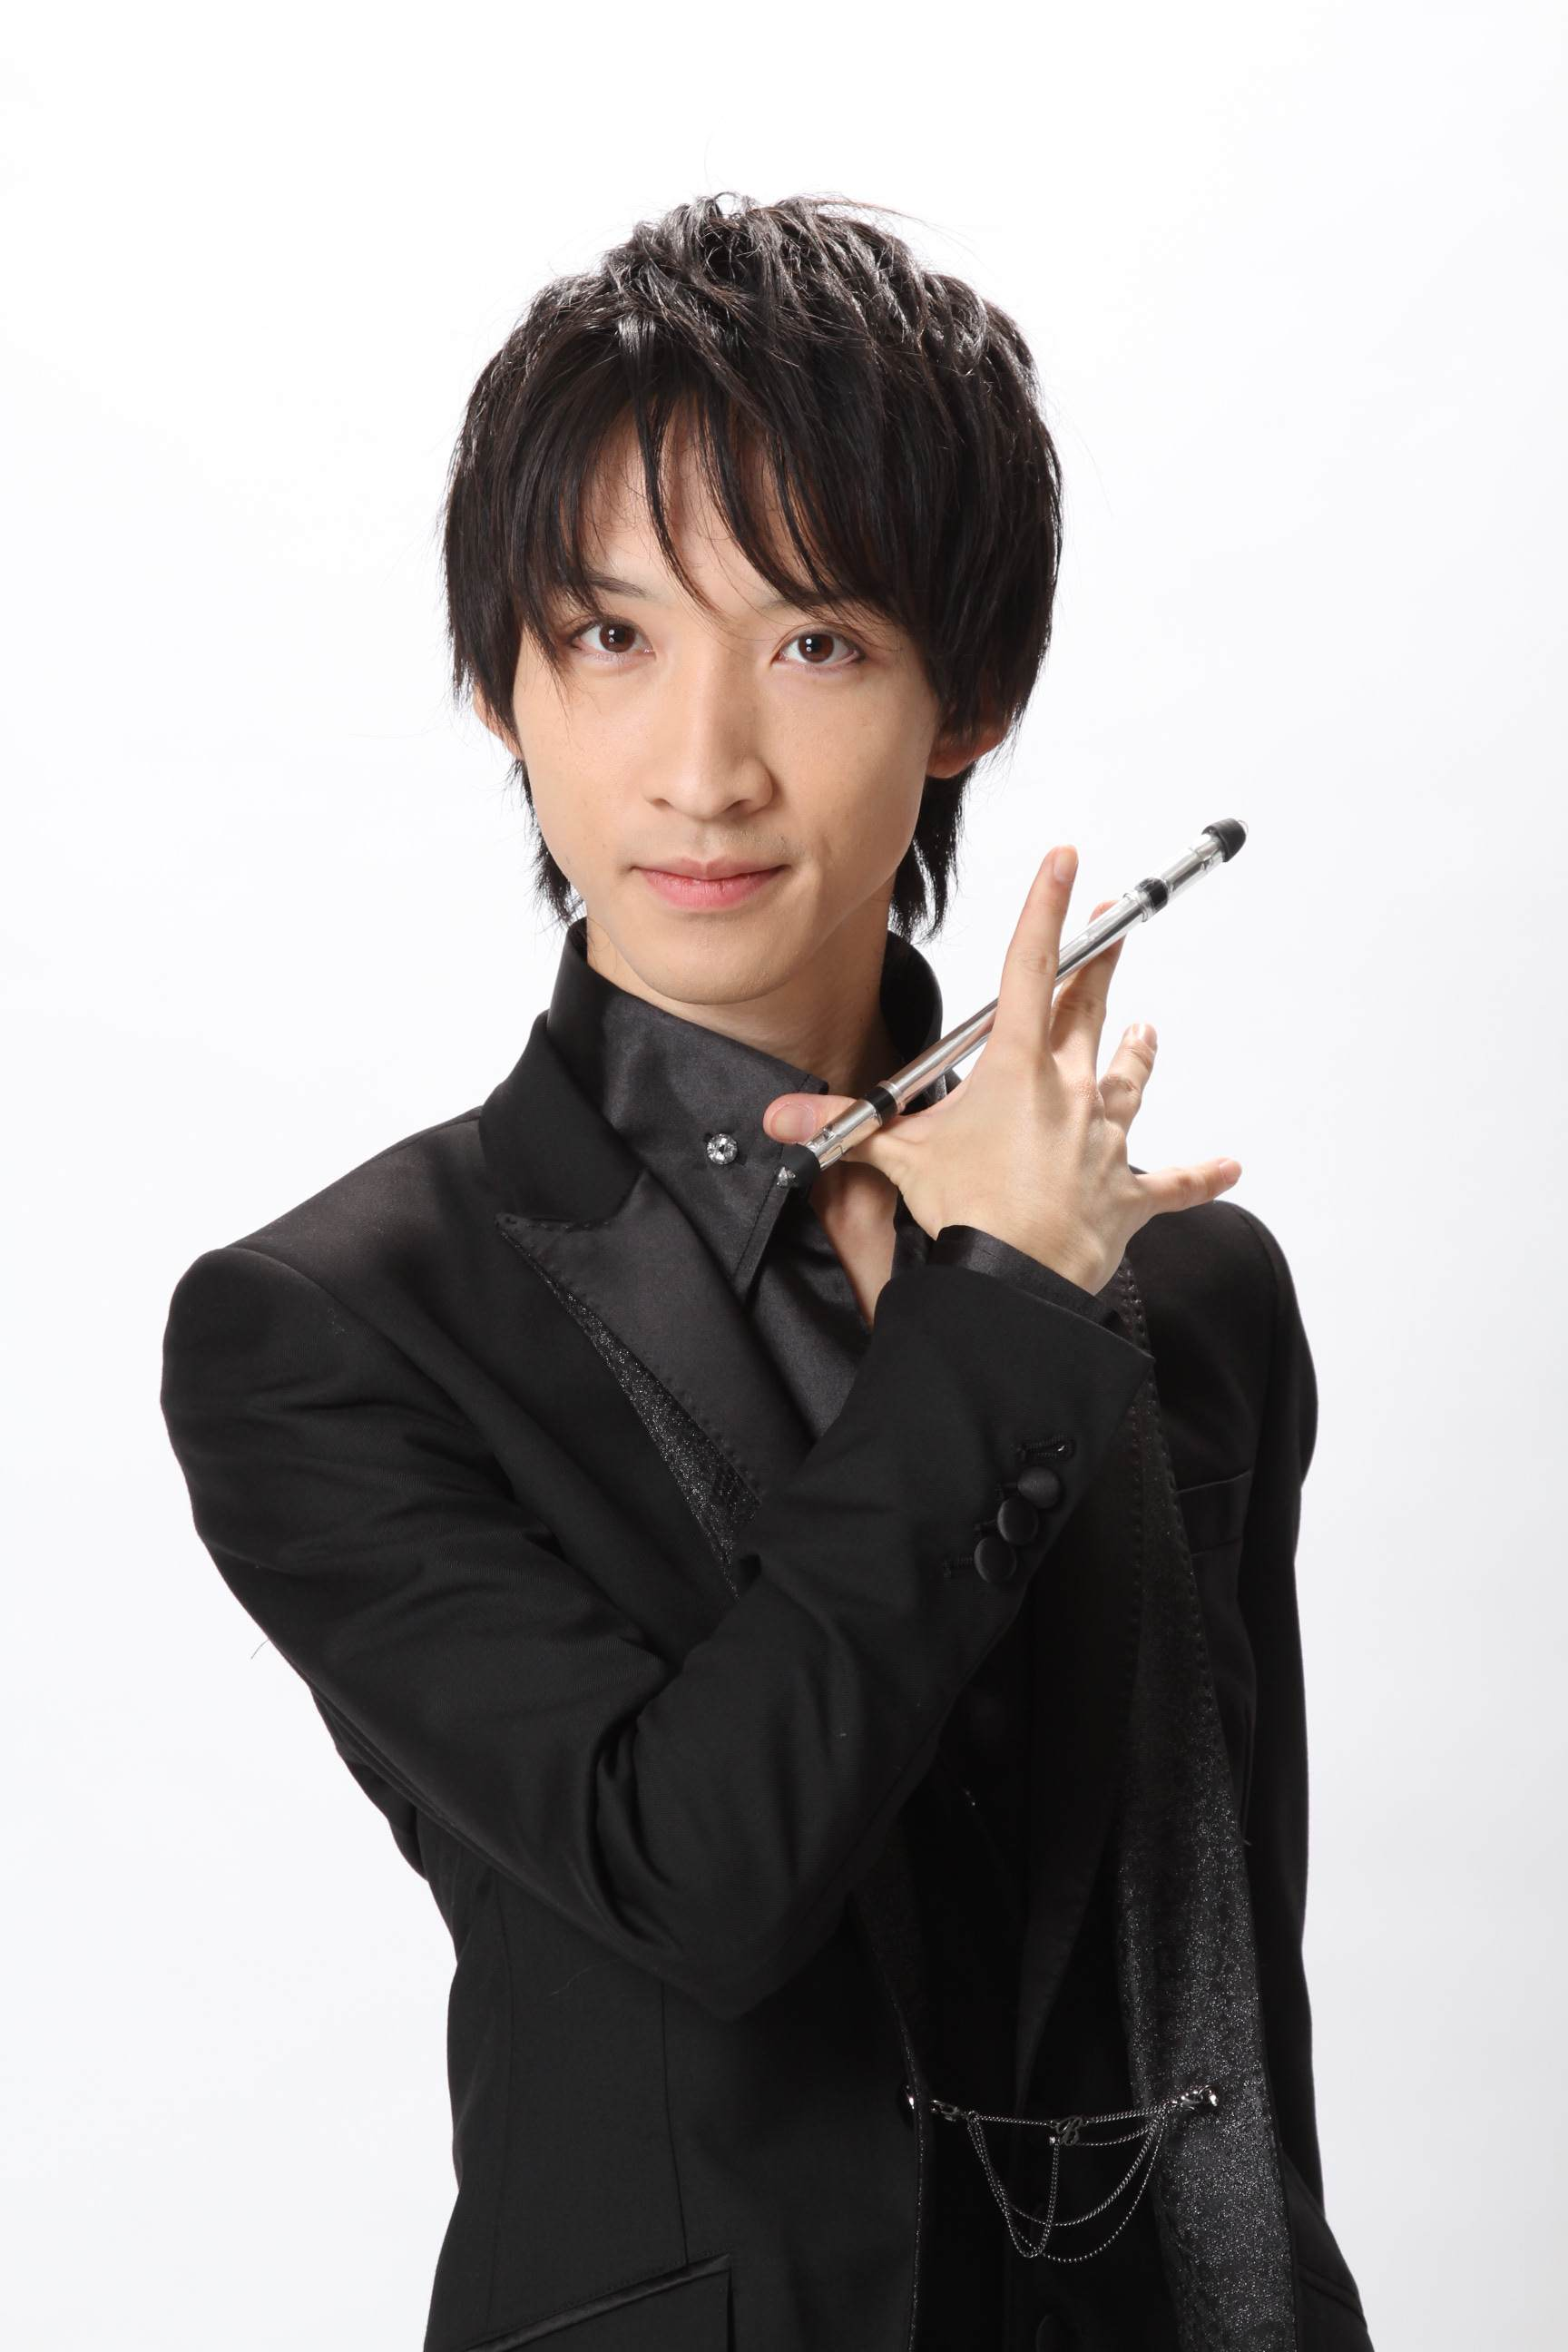 Performer Kay【ペンスピニグ&ジャグリングパフォーマーKay】